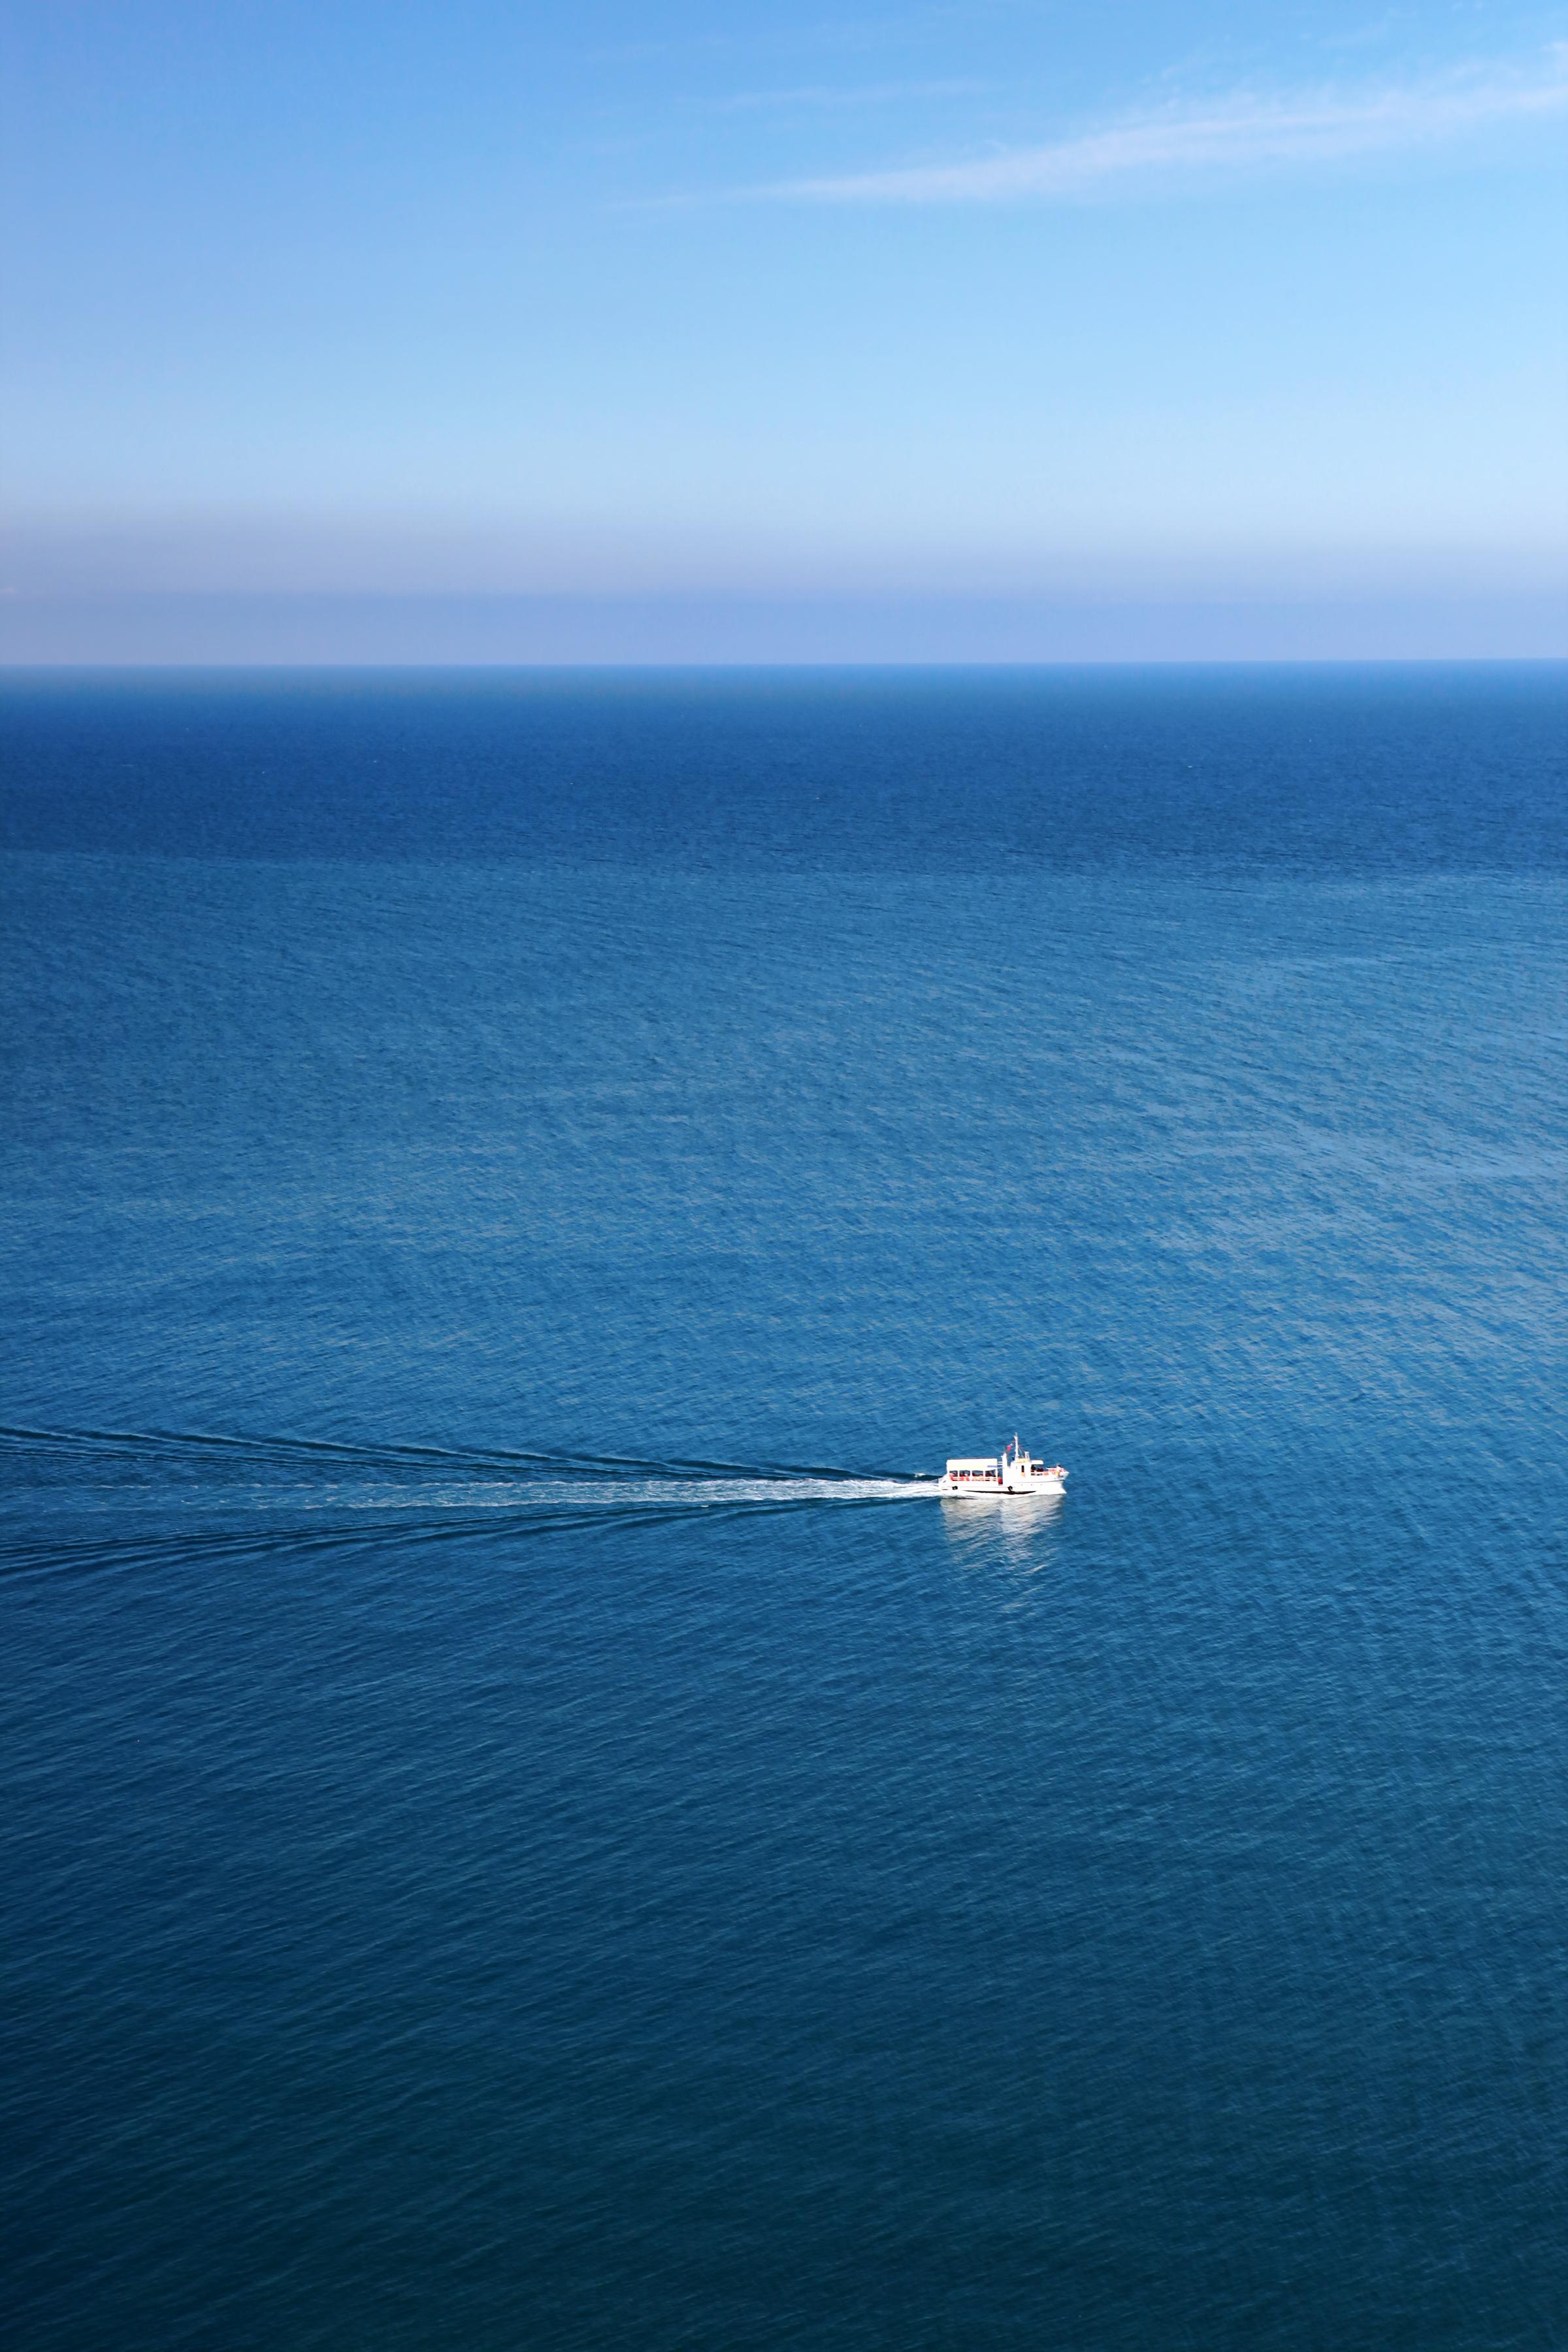 ship at sea, Shipping, Sky, Ship, Sea, HQ Photo